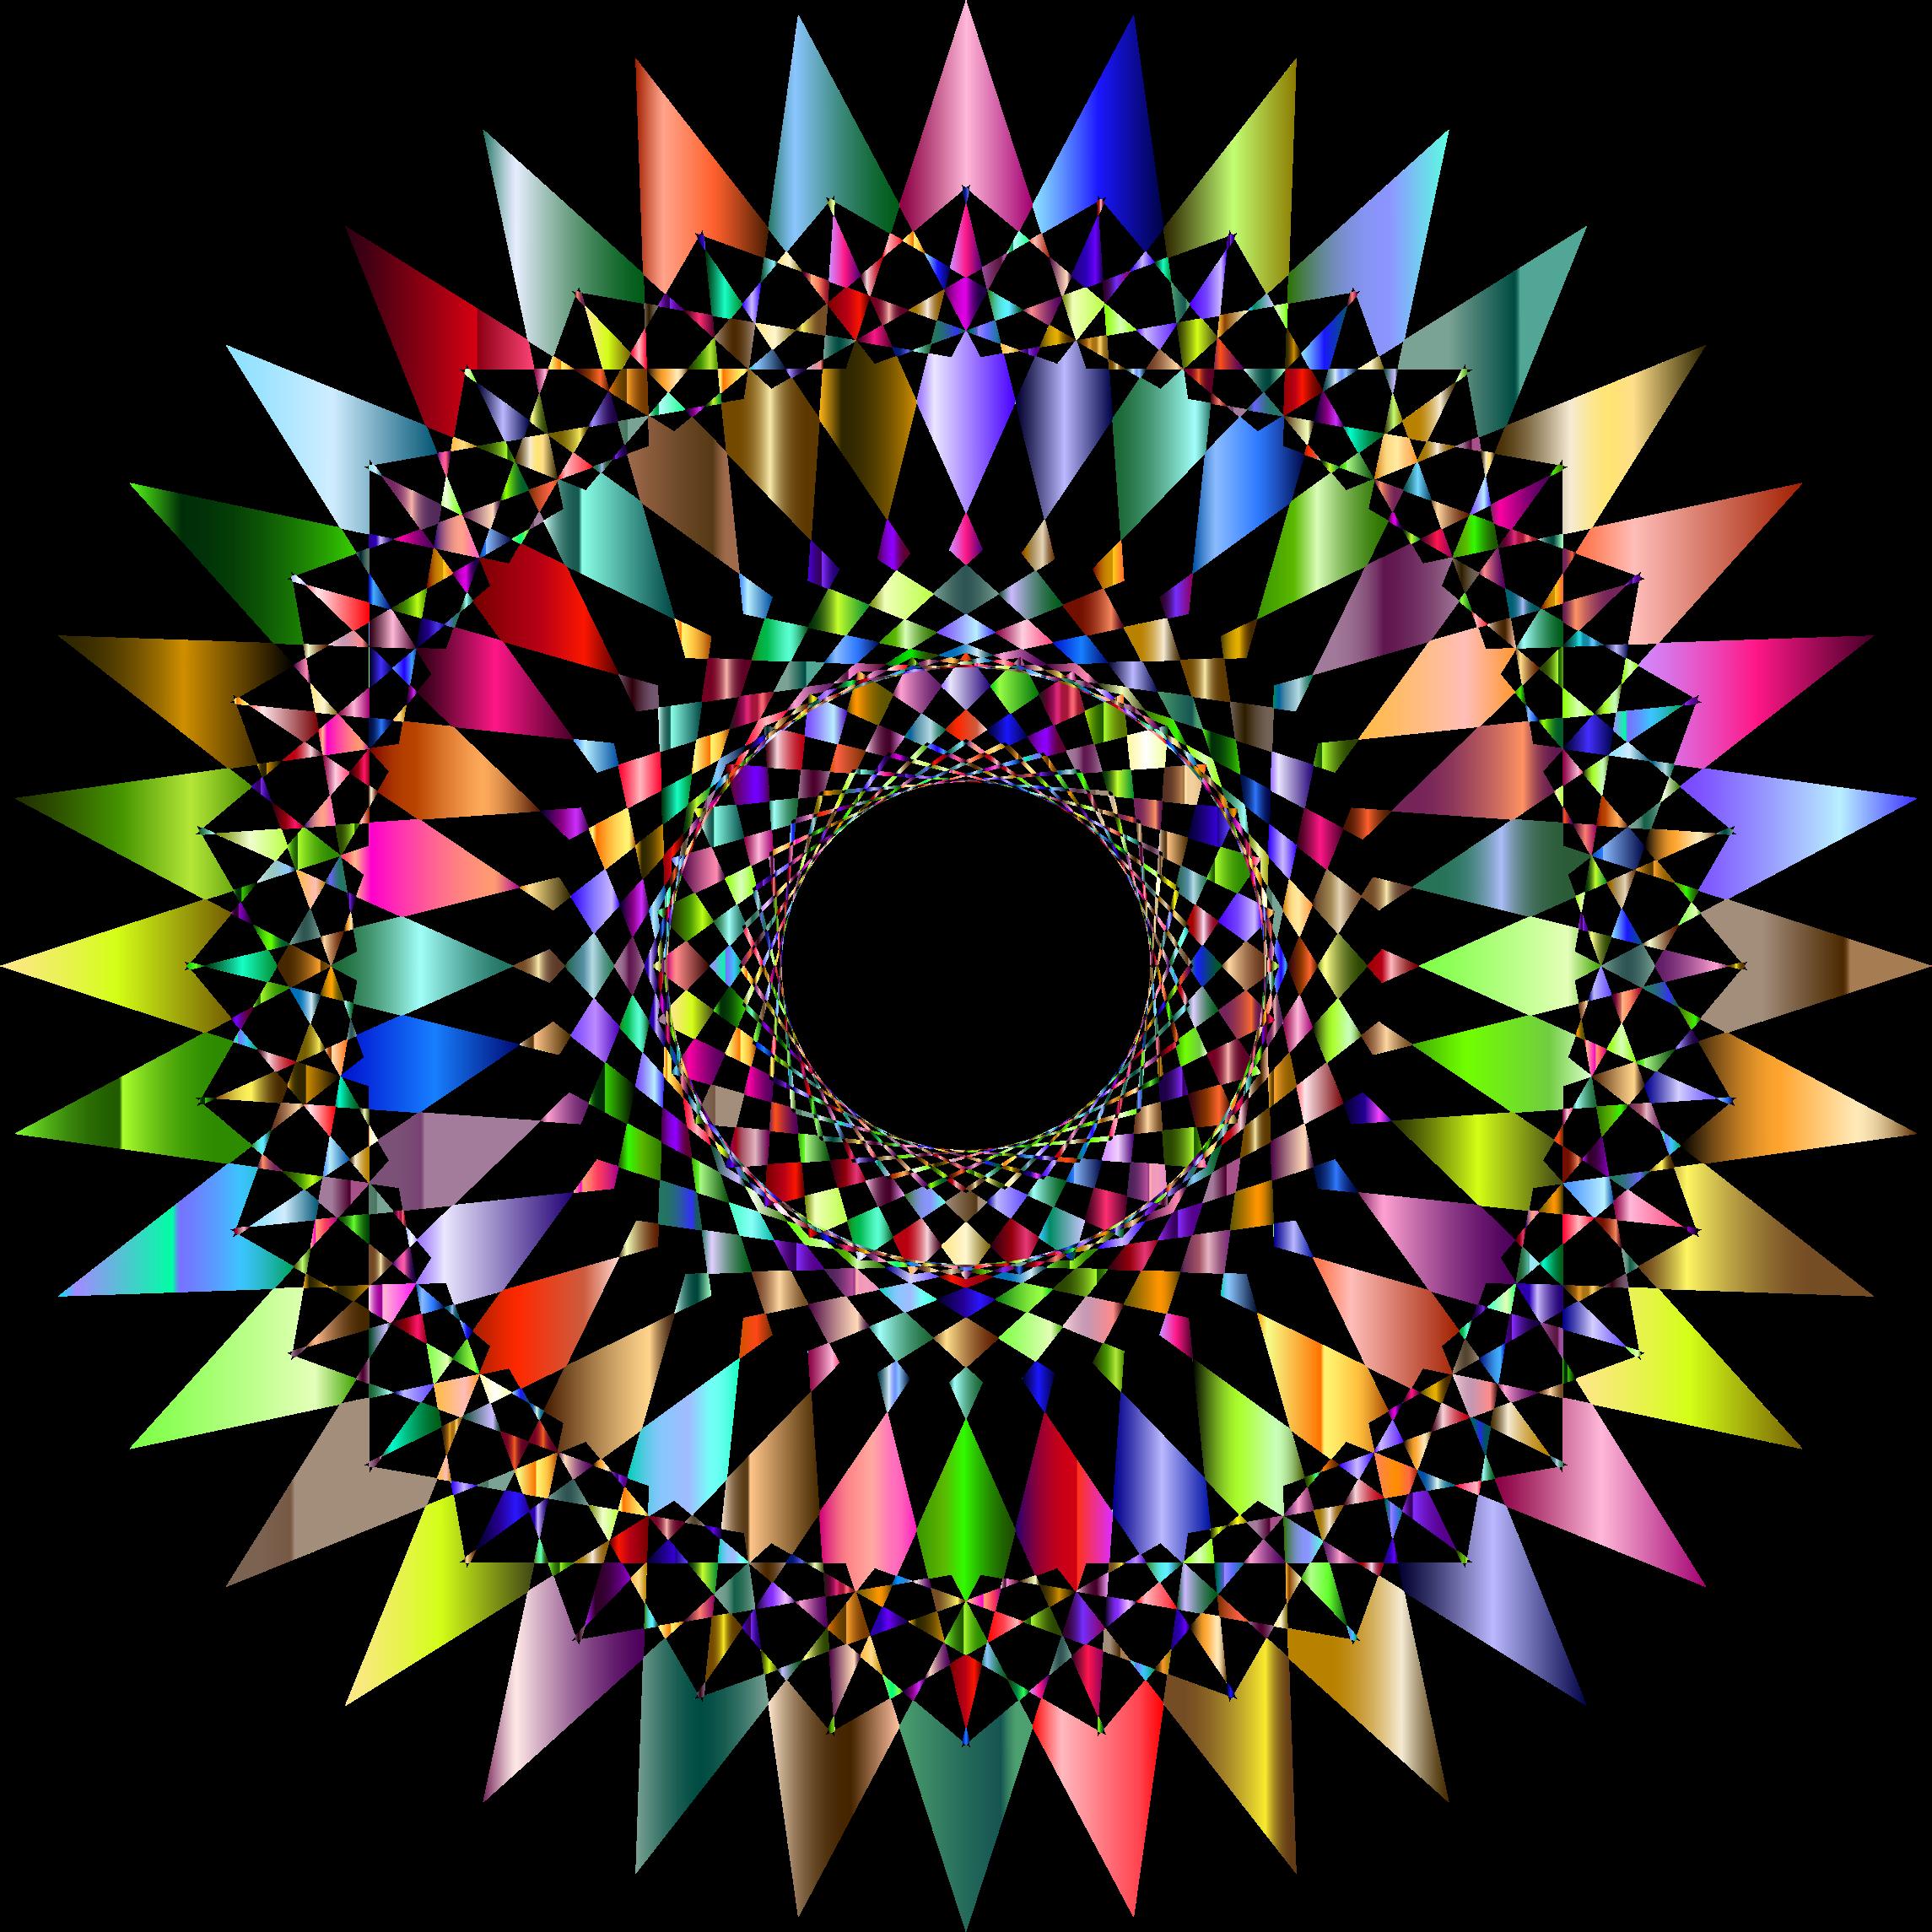 Decorative star clipart. Prismatic checkered no background